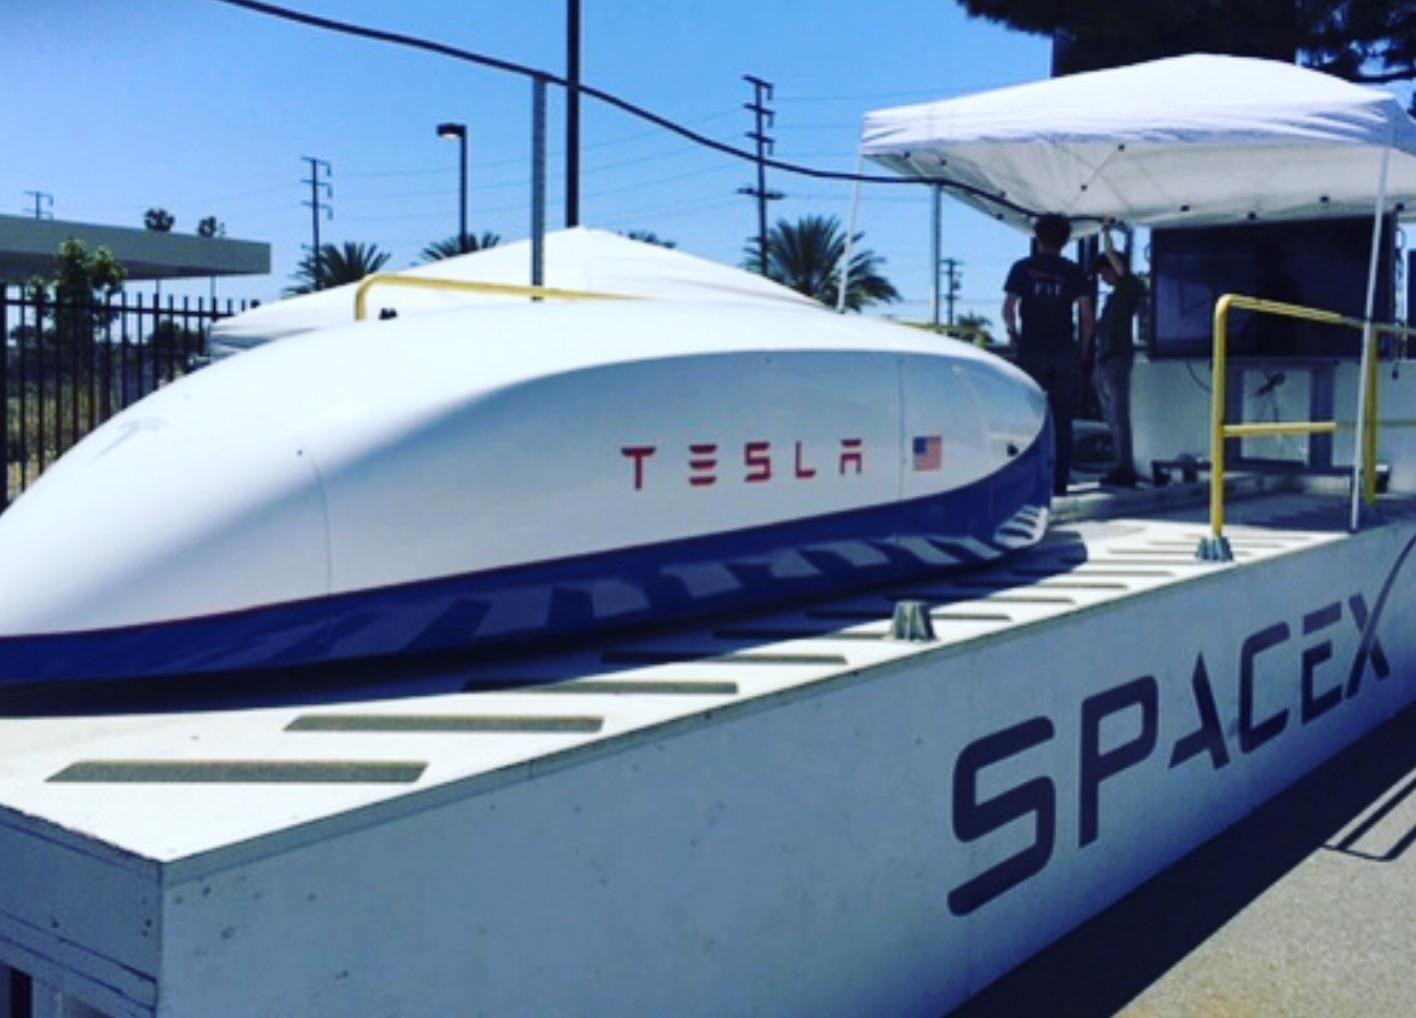 tesla-spacex-pusher [Credit: Elon Musk/Instagram]